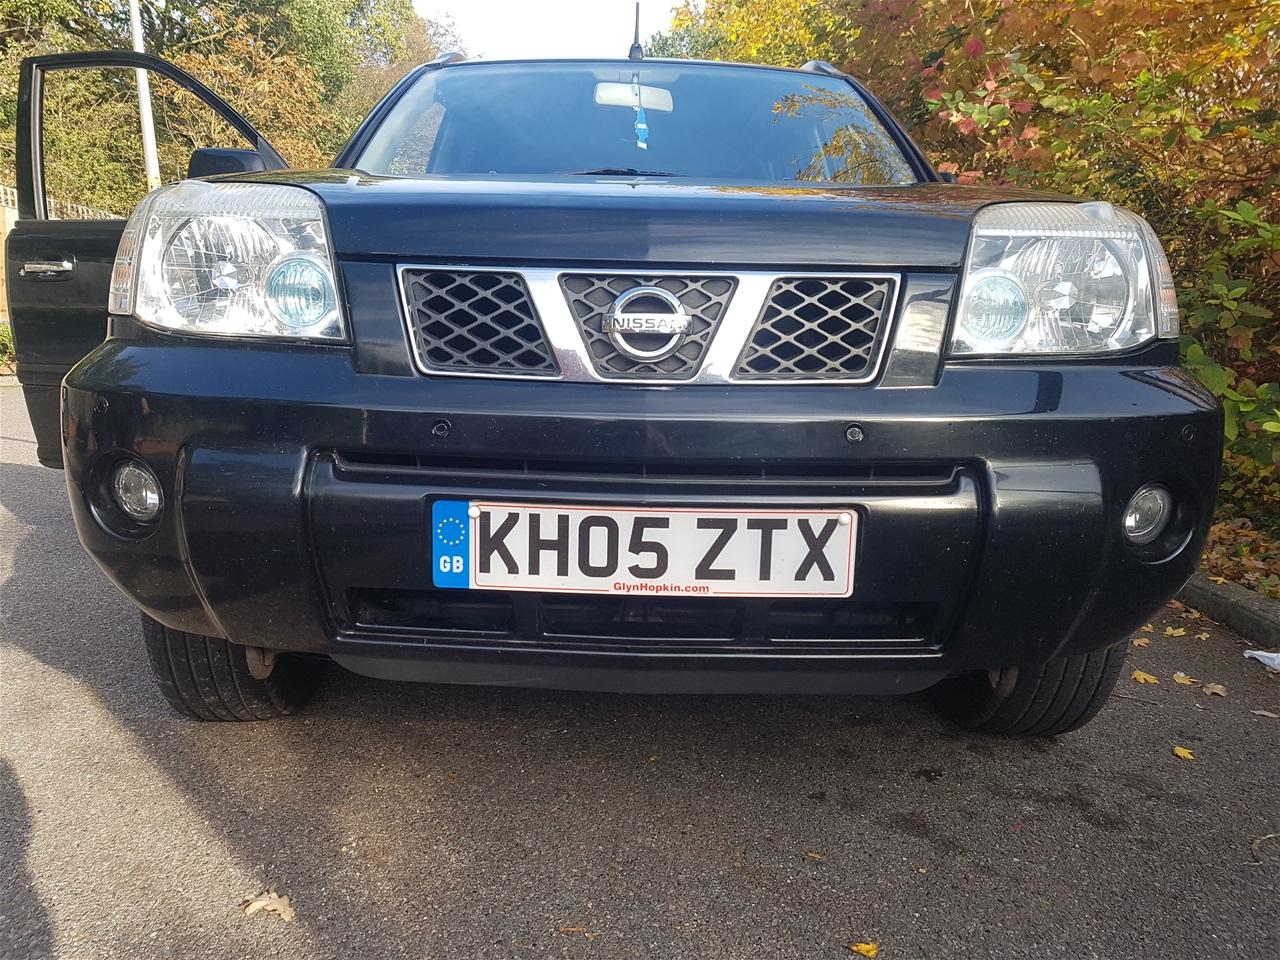 Nissan X-Trail front parking sensors